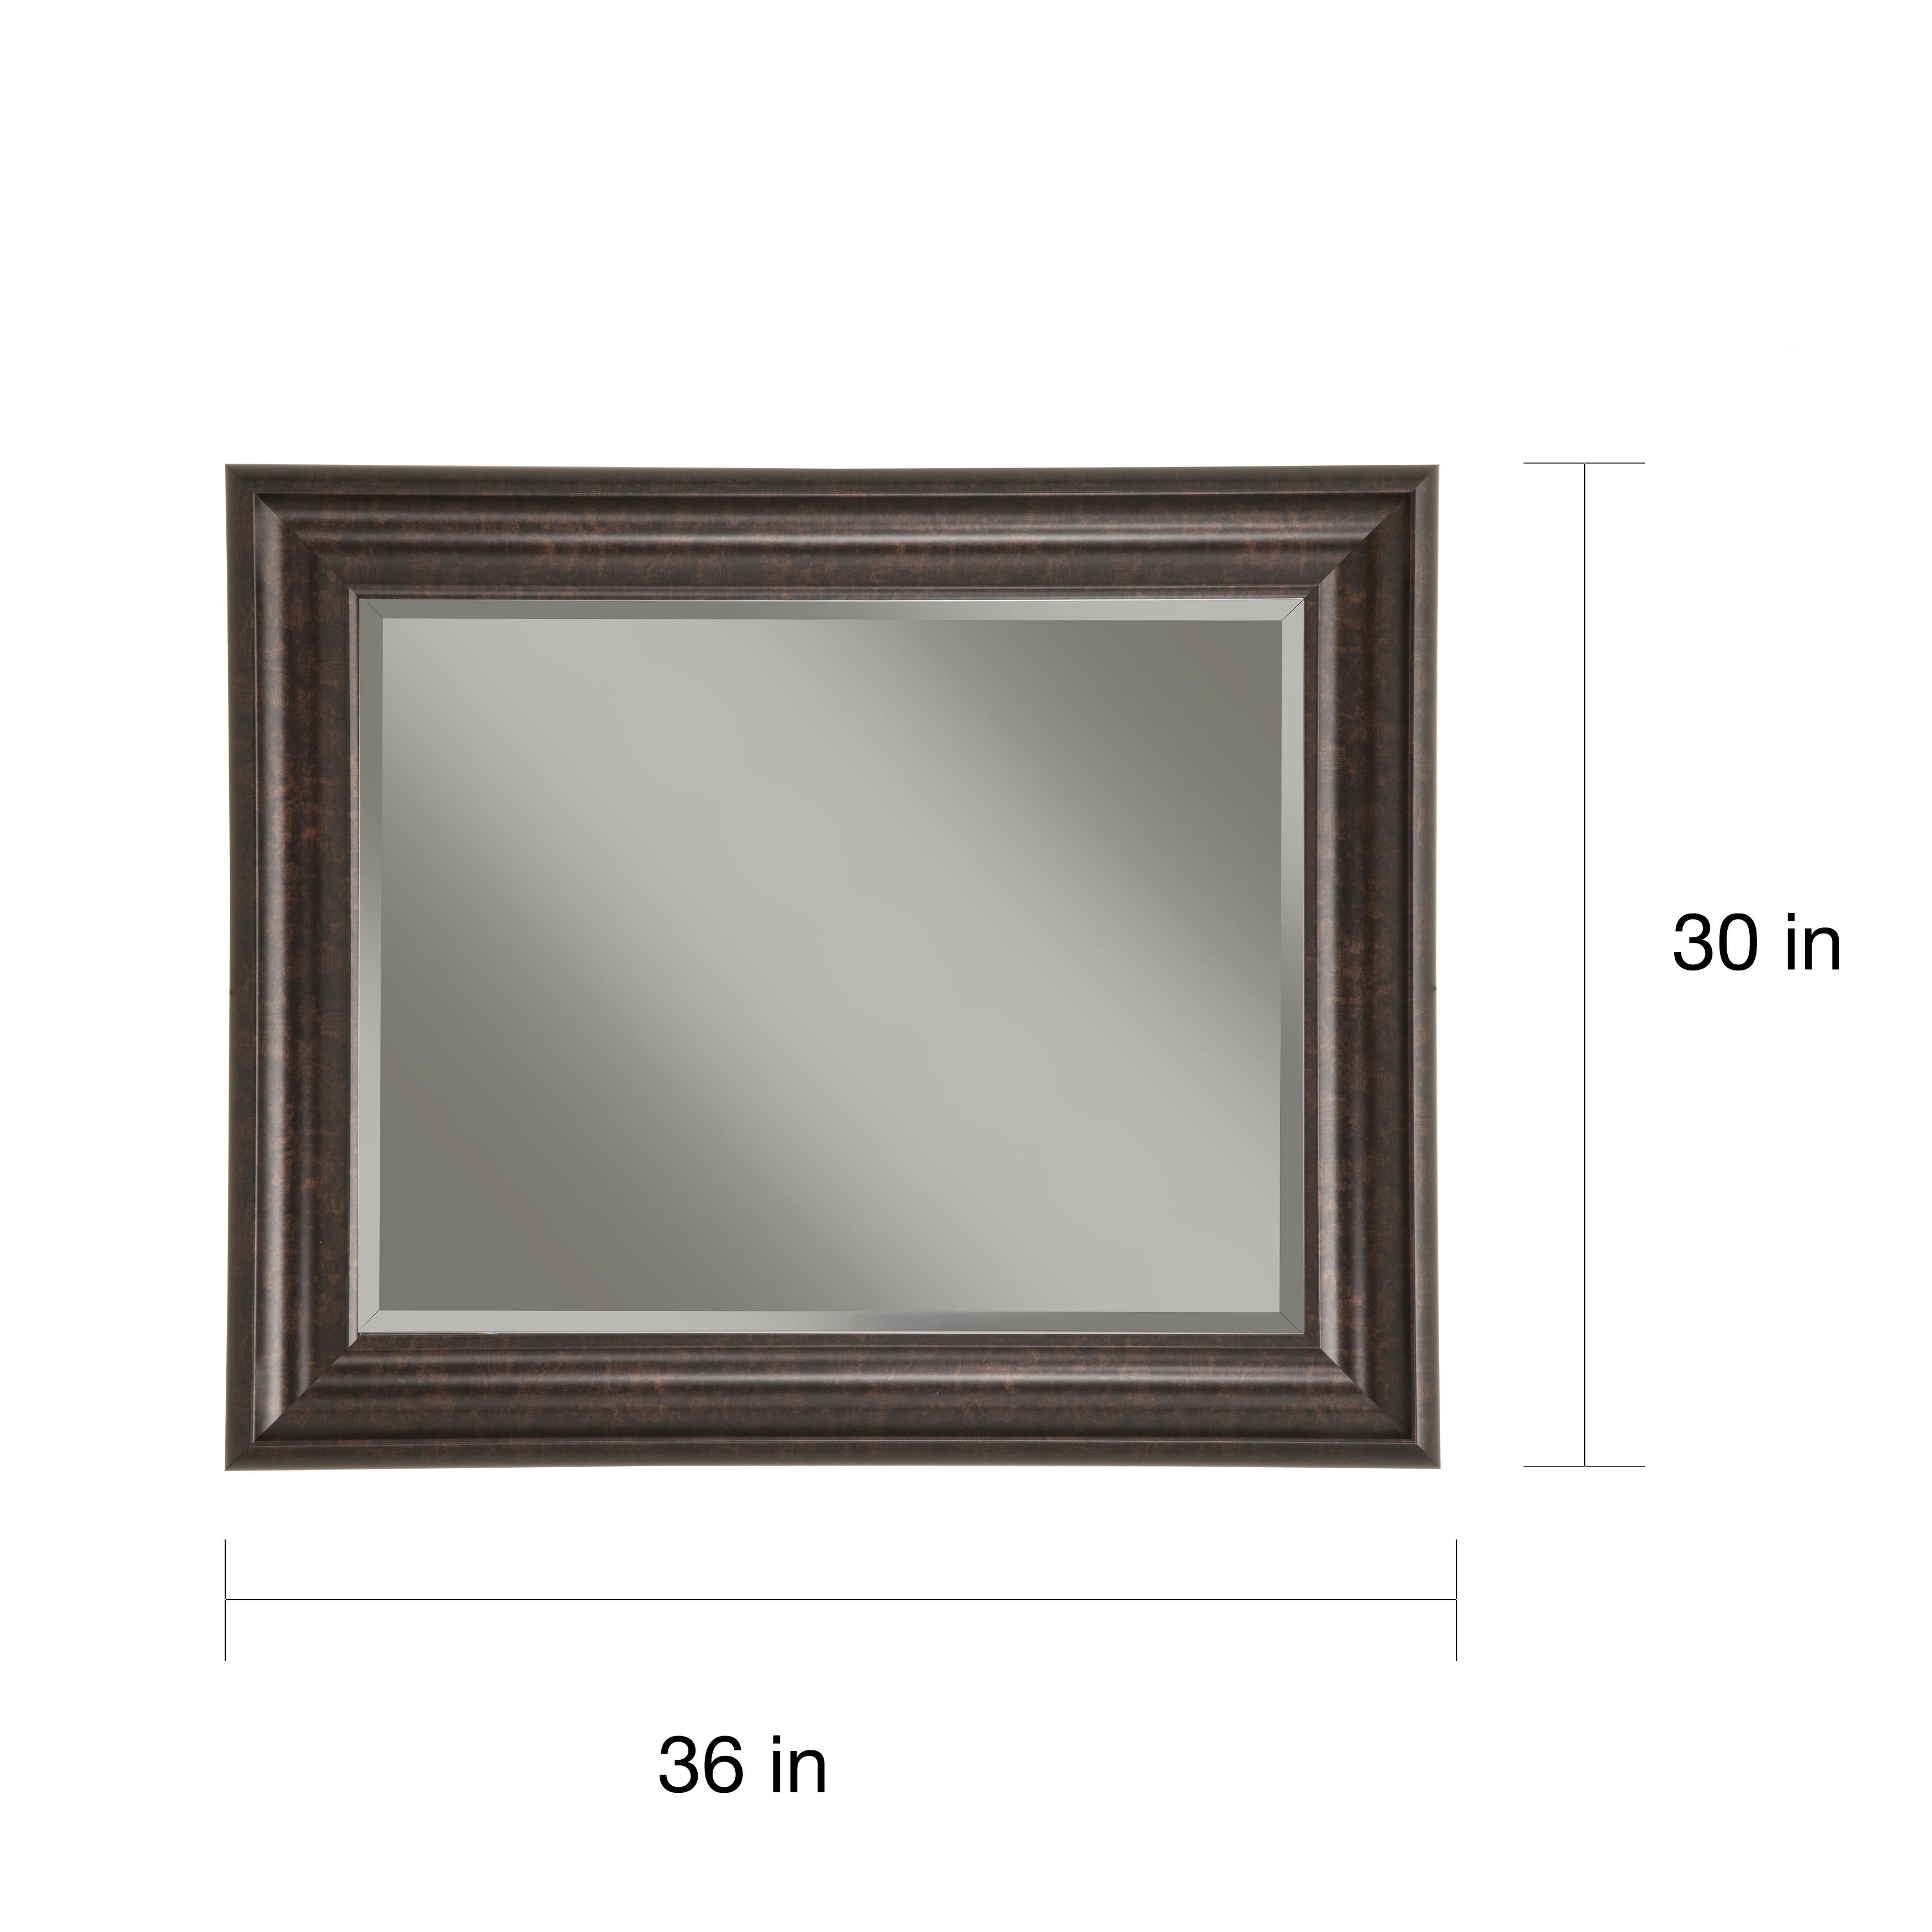 Sandberg Furniture Oil-rubbed Bronze 36 x 30-inch Wall Mirror - Free ...